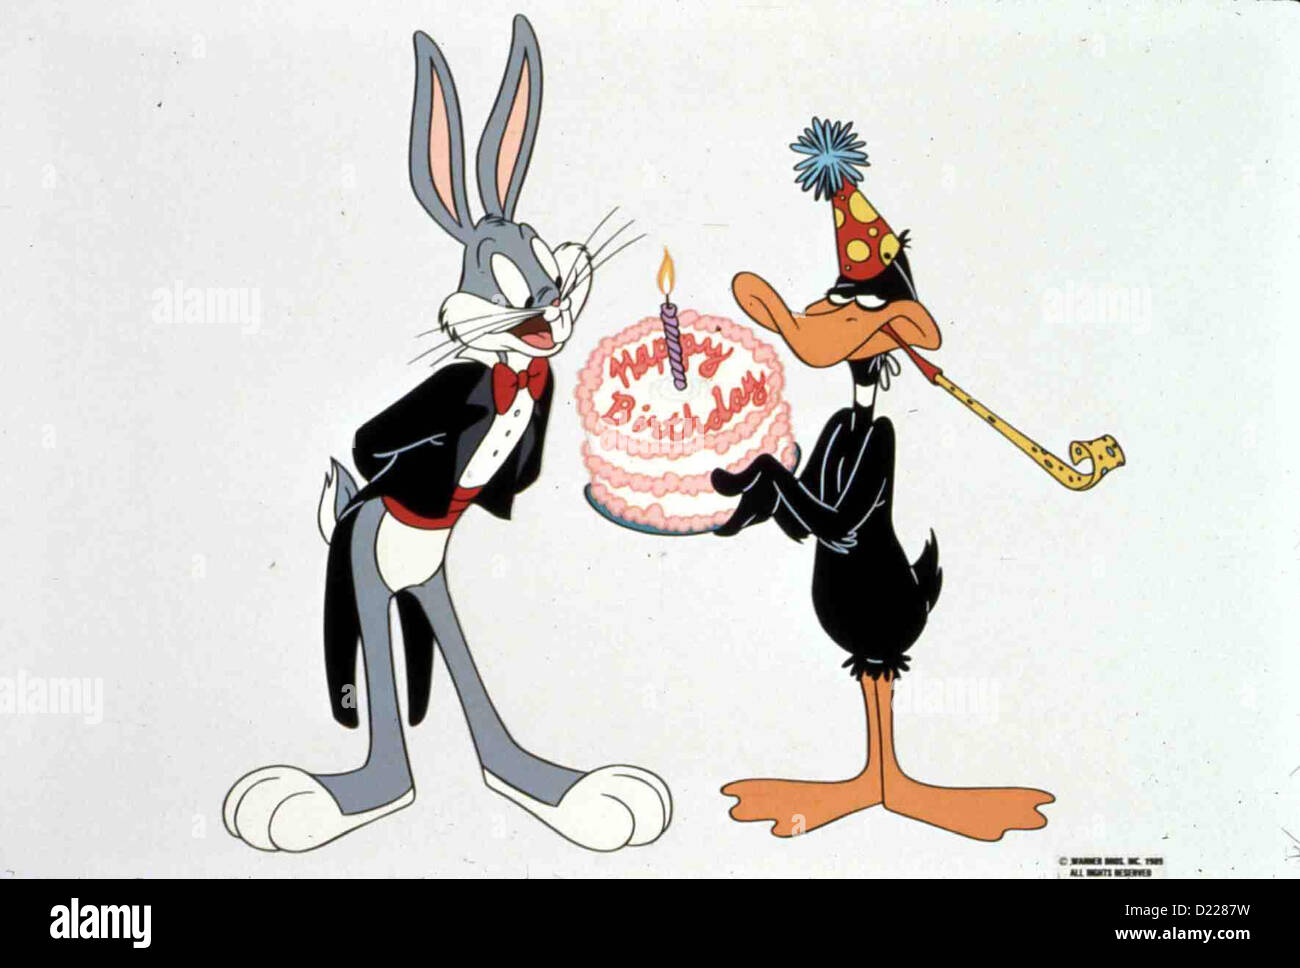 bugs bunny birthday Happy Birthday Bugs Happy Birthday Bugs Bugs Bunny und Daffy Duck  bugs bunny birthday